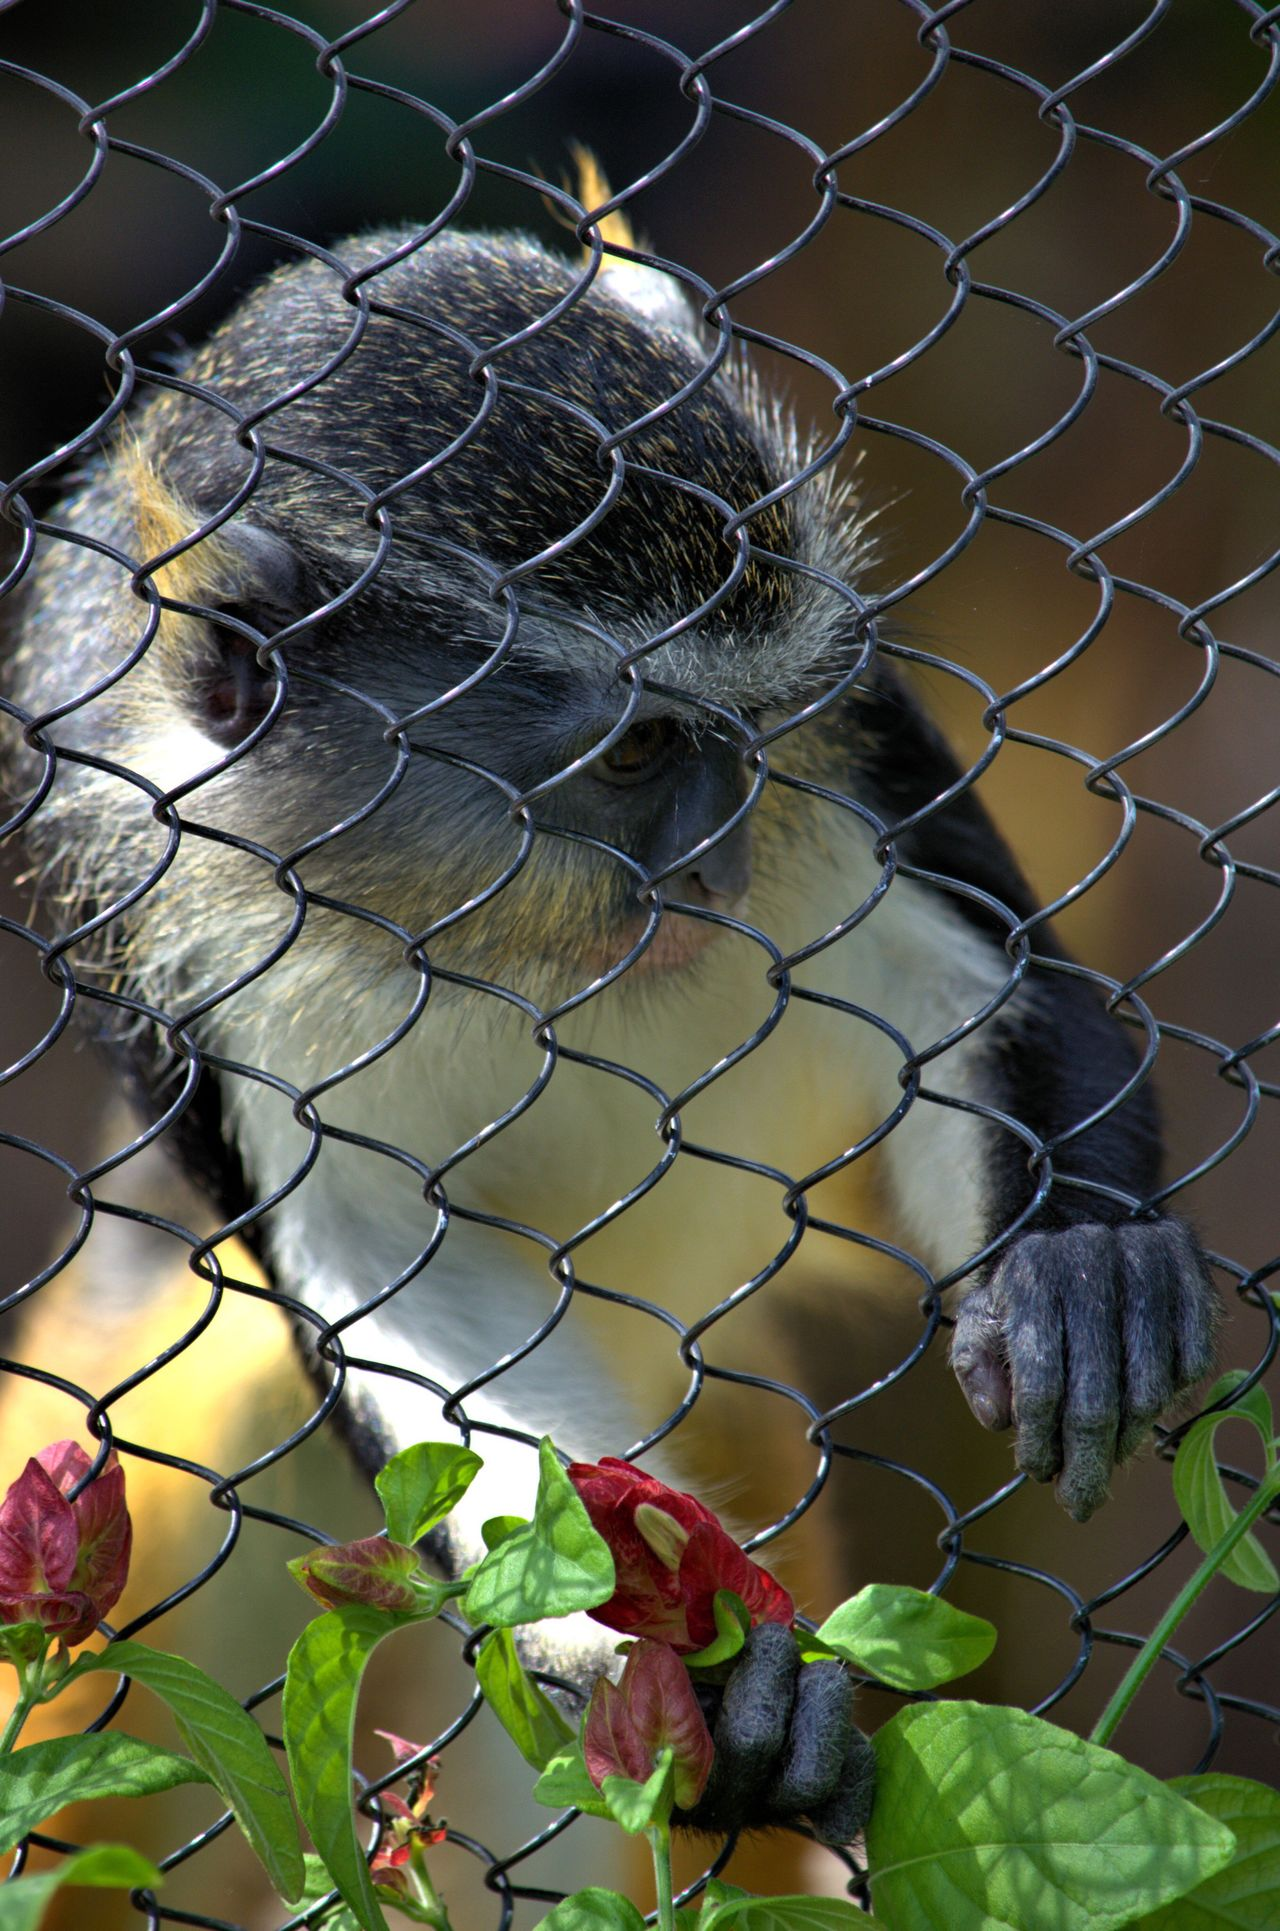 Cage Chainlink Fence Animals In Captivity Mammal San Antonio Zoo San Antonio, Texas Zoo Animal